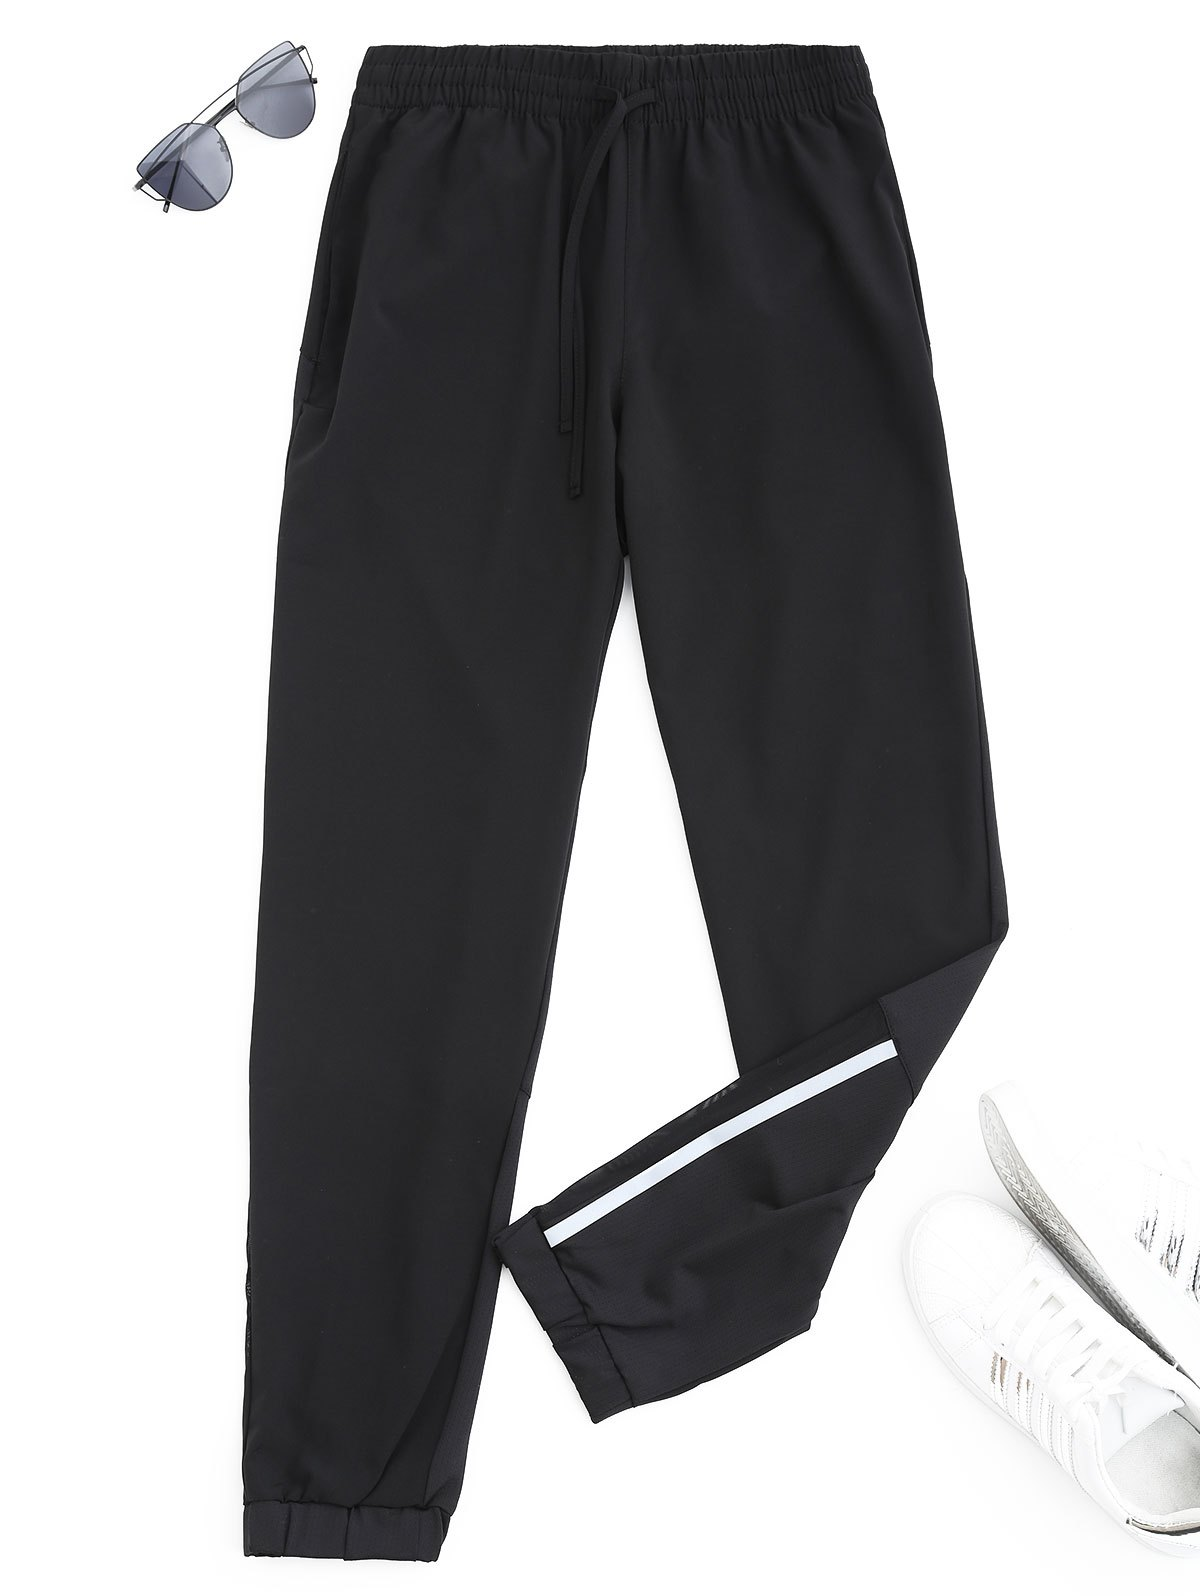 Pantalons sportifs à cône